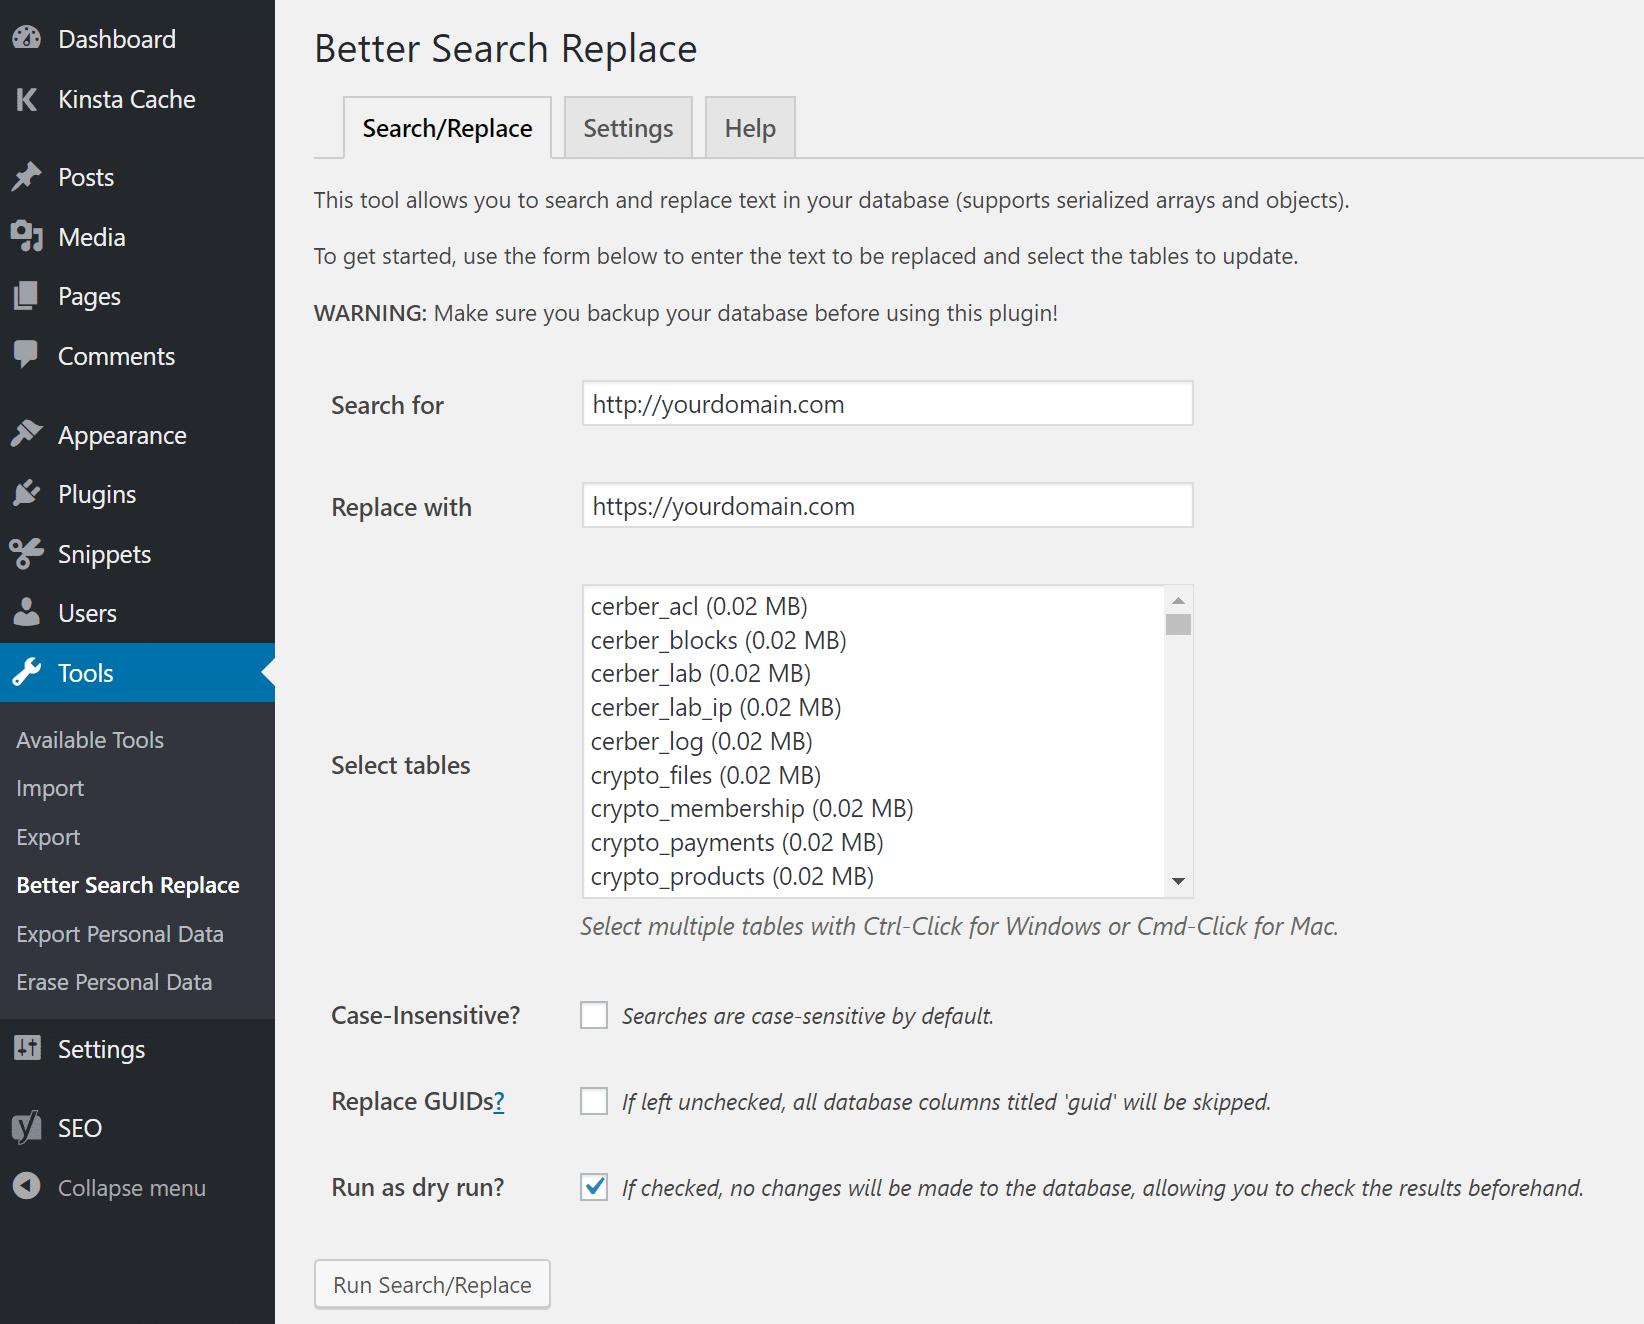 Opções do Better Search Replace